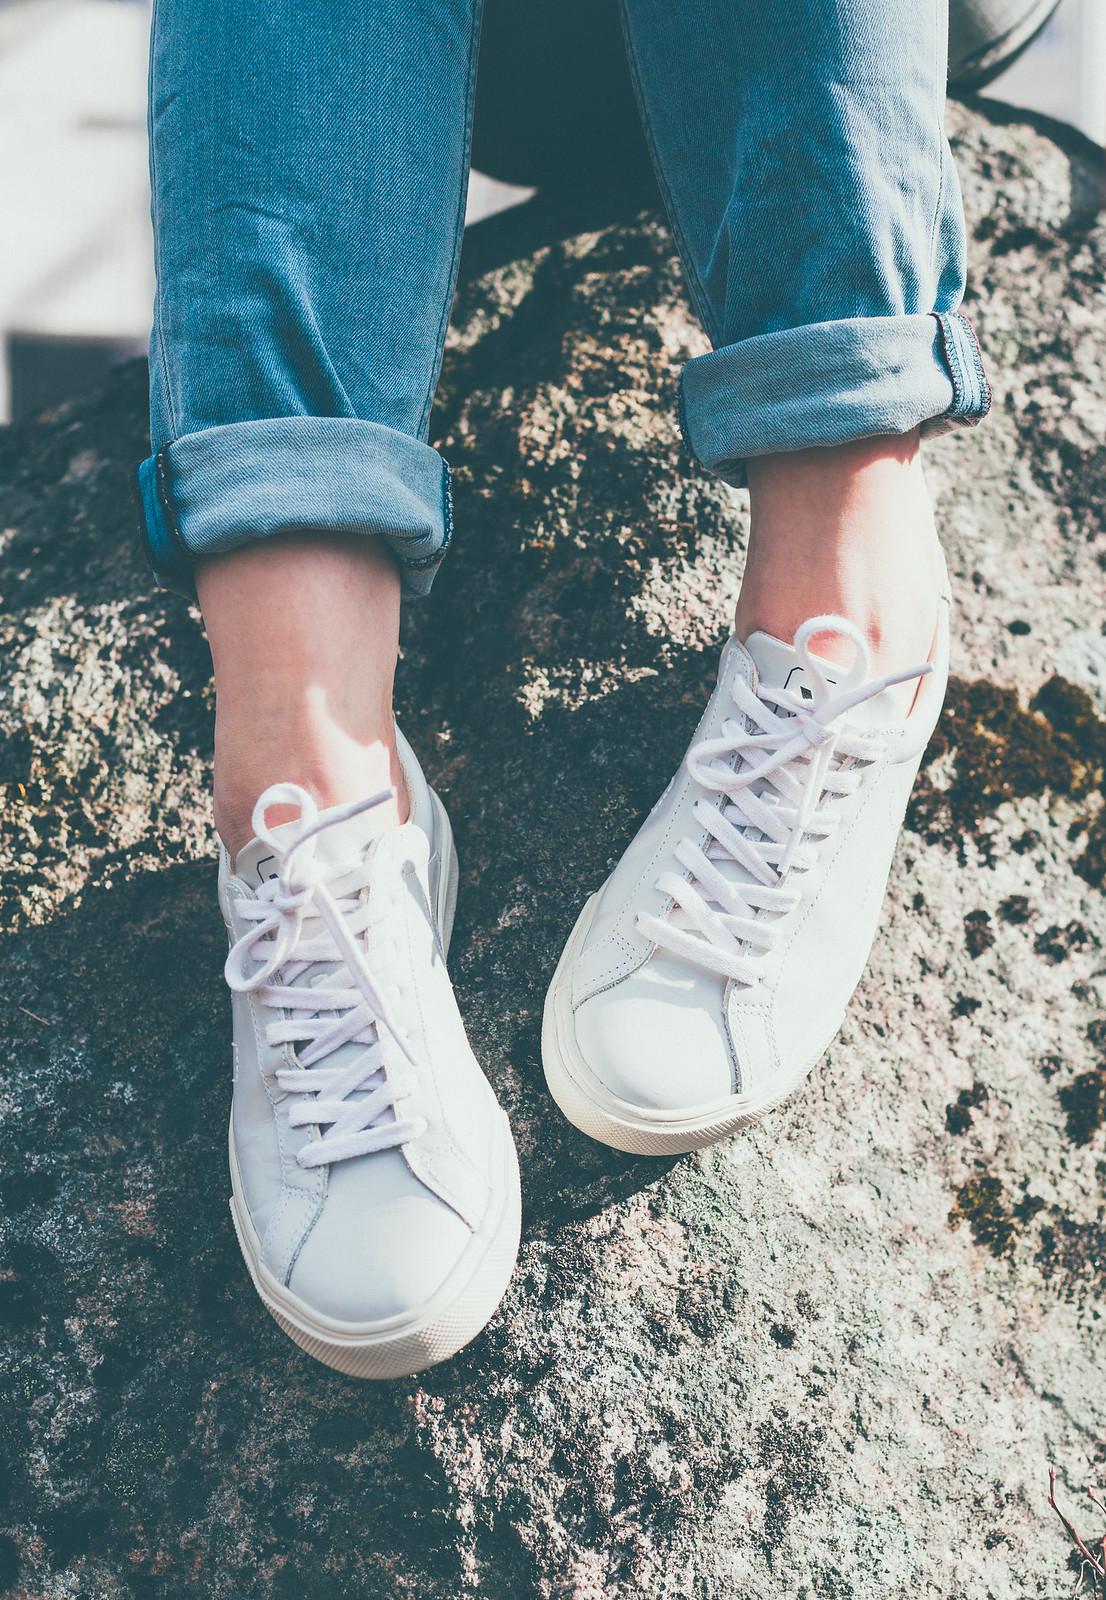 Ekologiska sneakers från Ecosphere - Evelinas Ekologiska